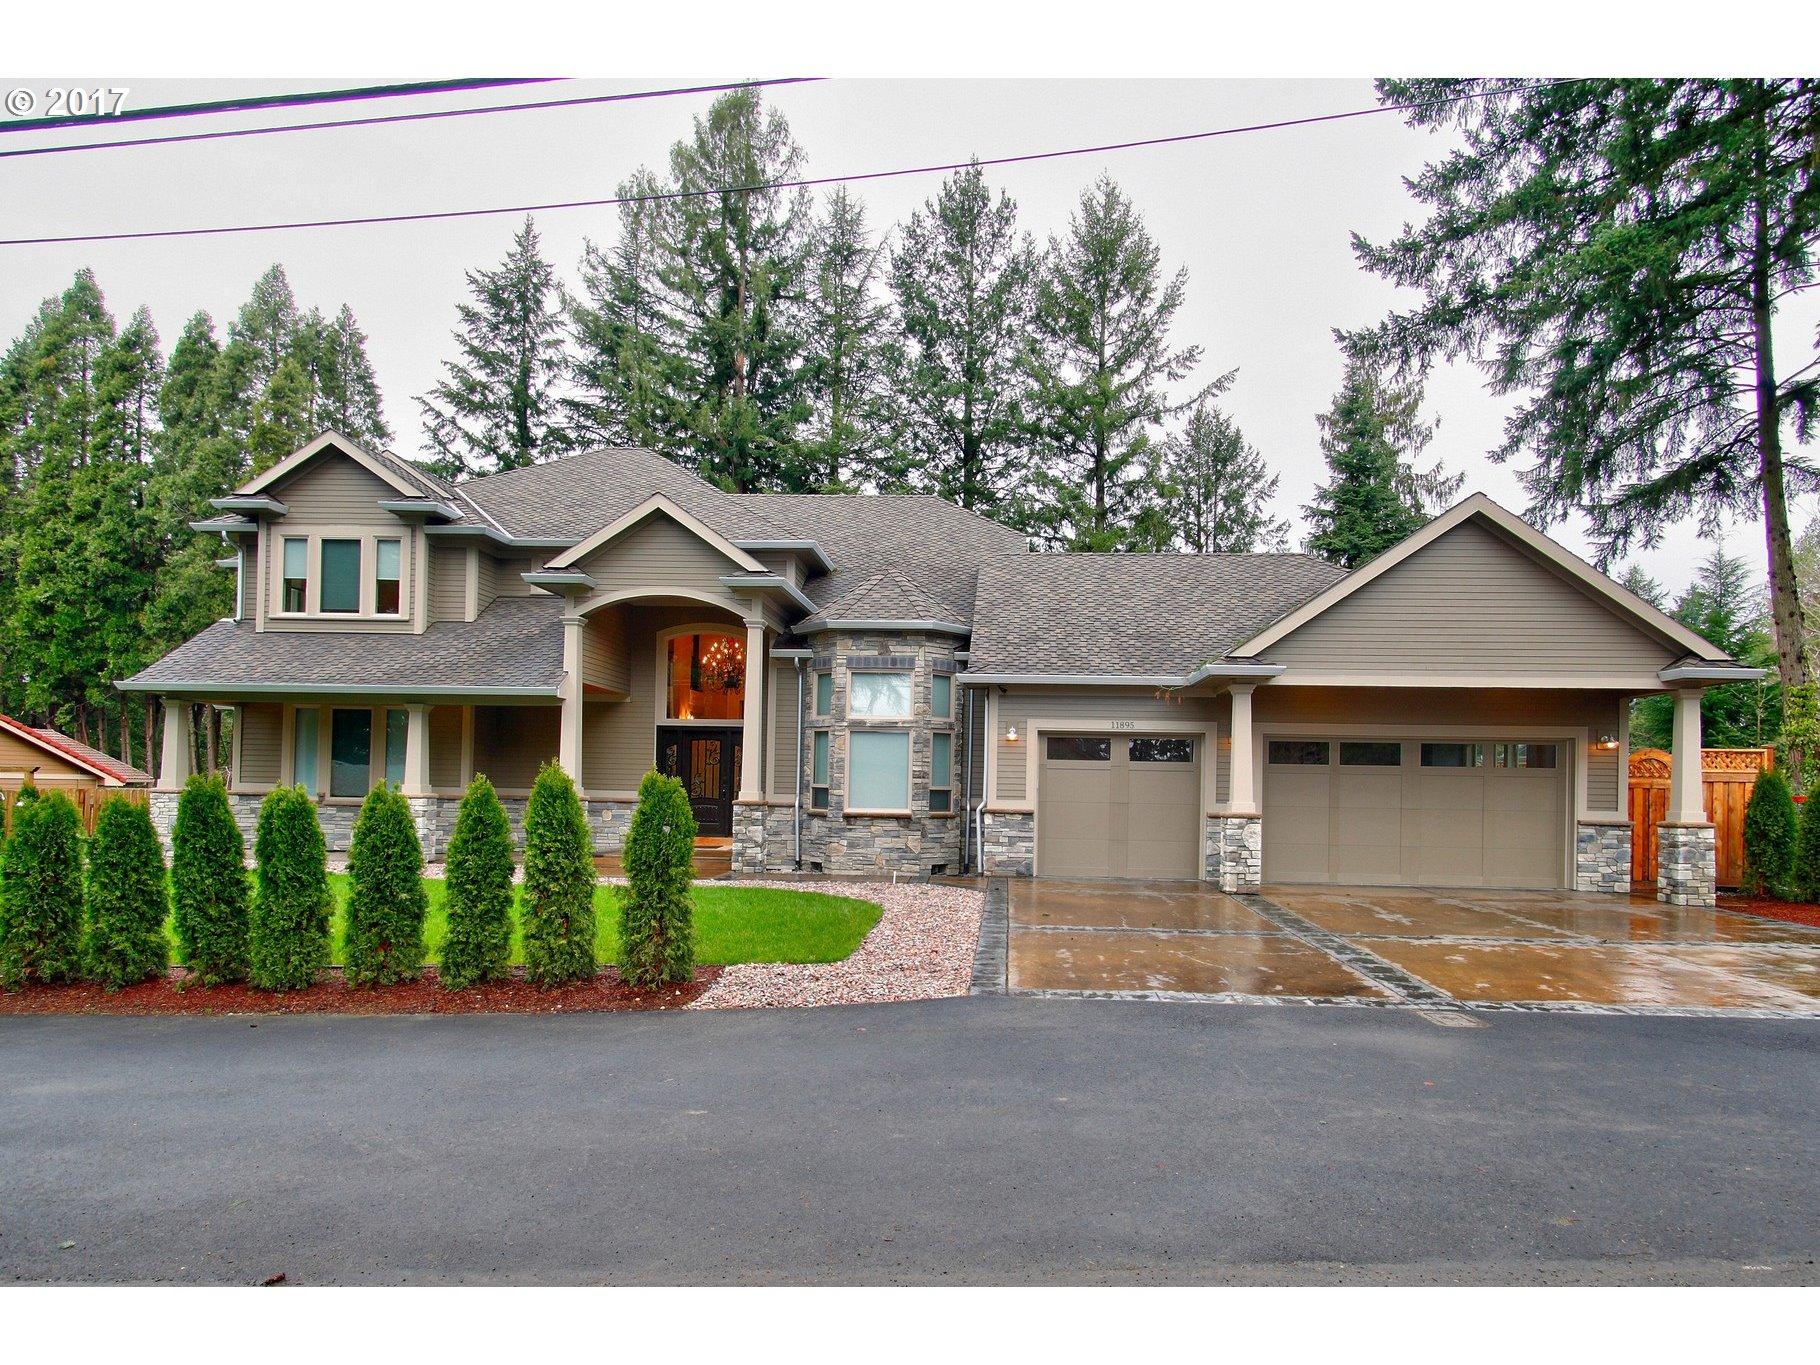 11895 SW BUTNER RD, Portland, OR 97225